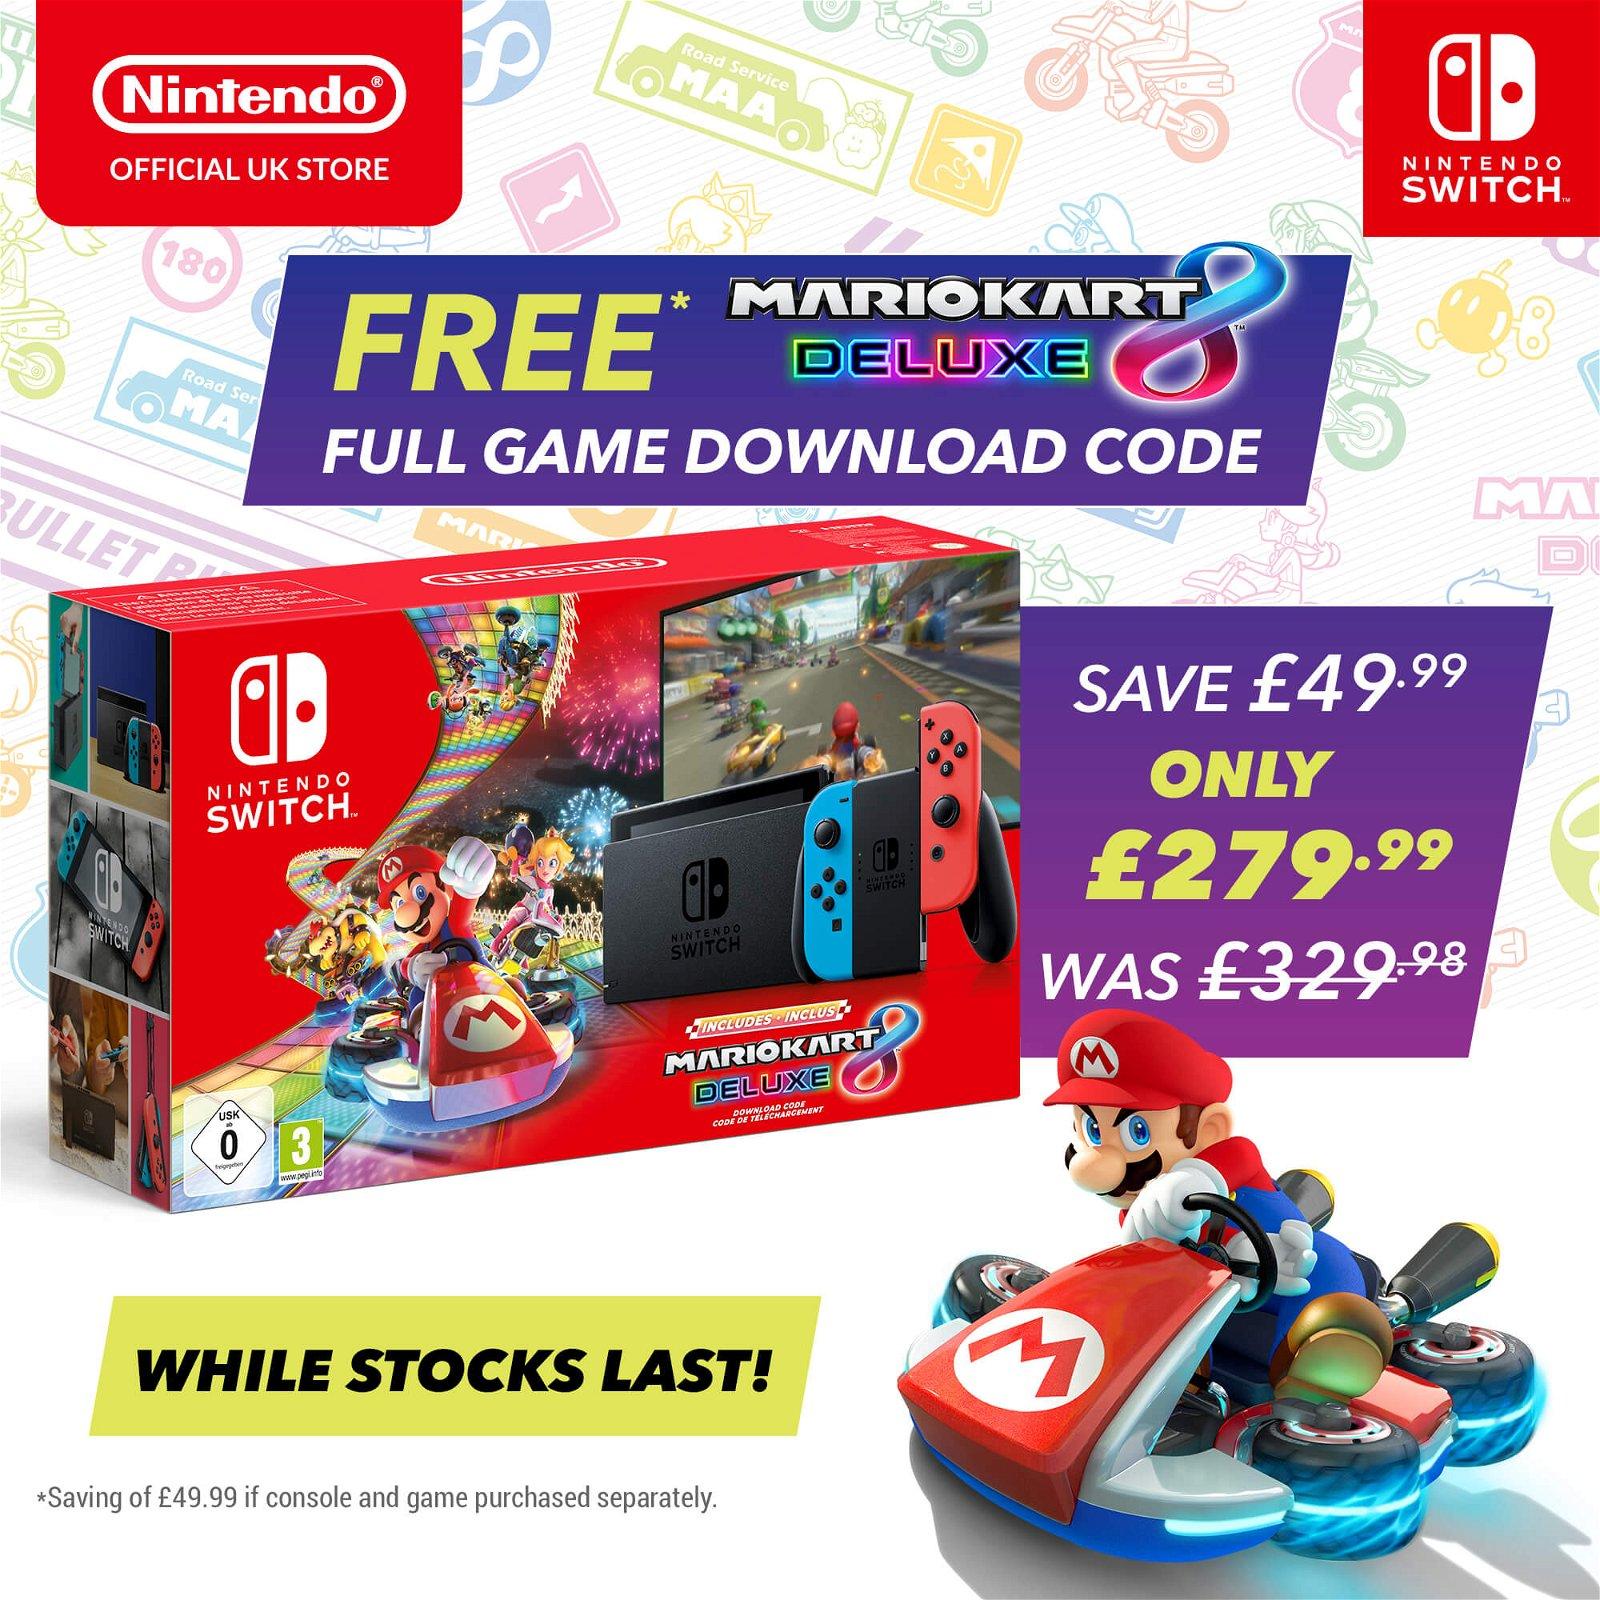 Nintendo Free Mario Kart 8 Deluxe With Nintendo Switch